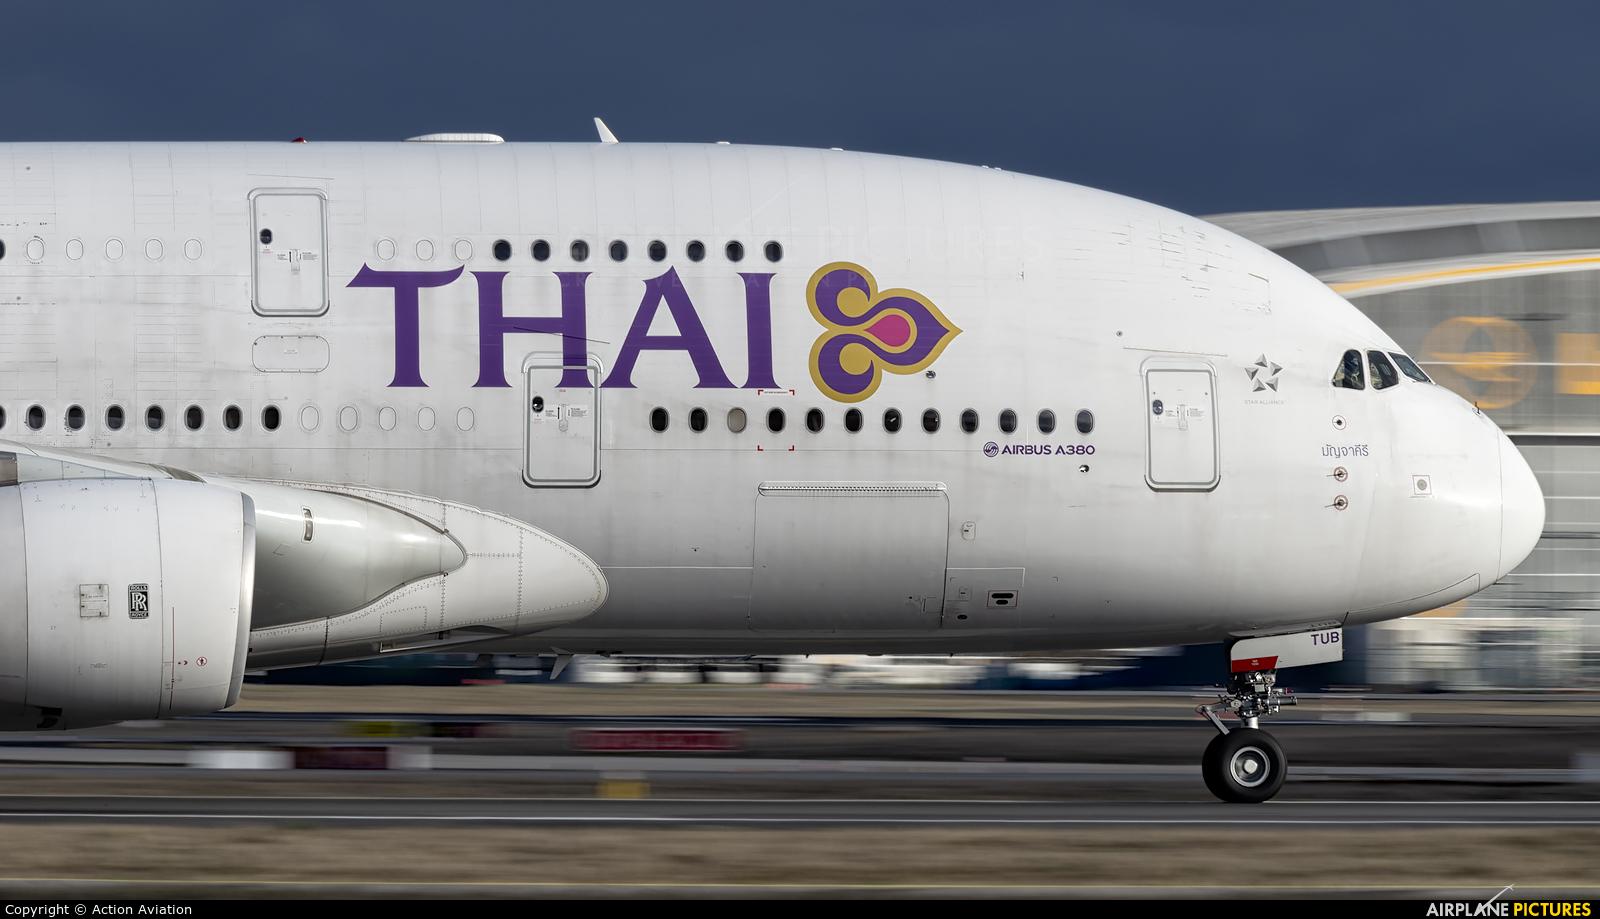 Thai Airways HS-TUB aircraft at Frankfurt